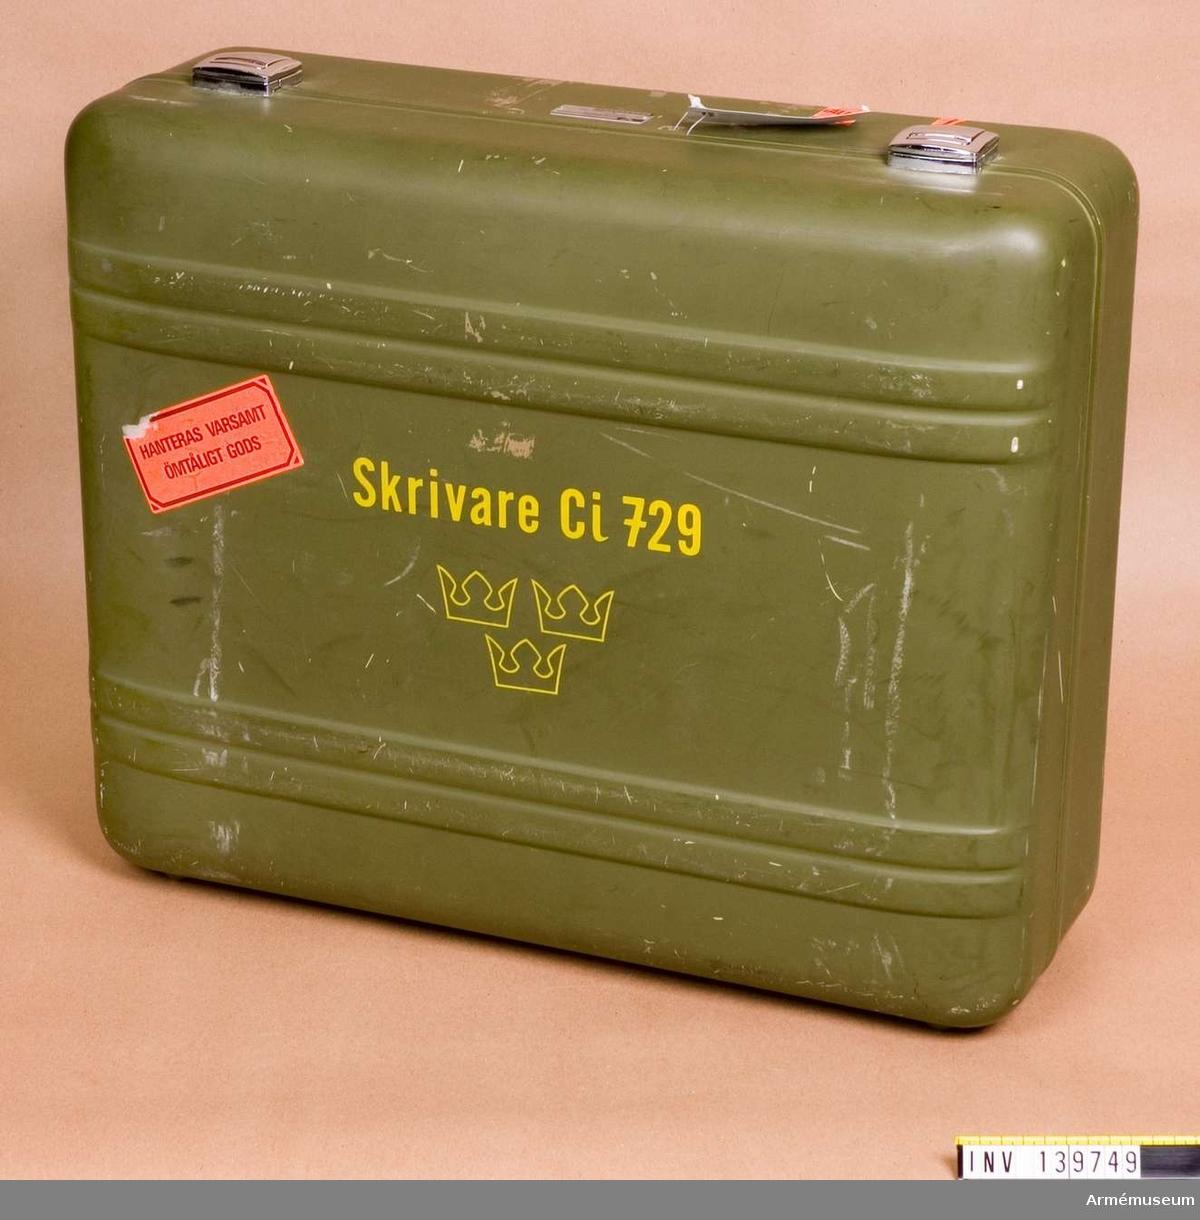 Skrivare till CI 729 fälthaubits 77A. Il.